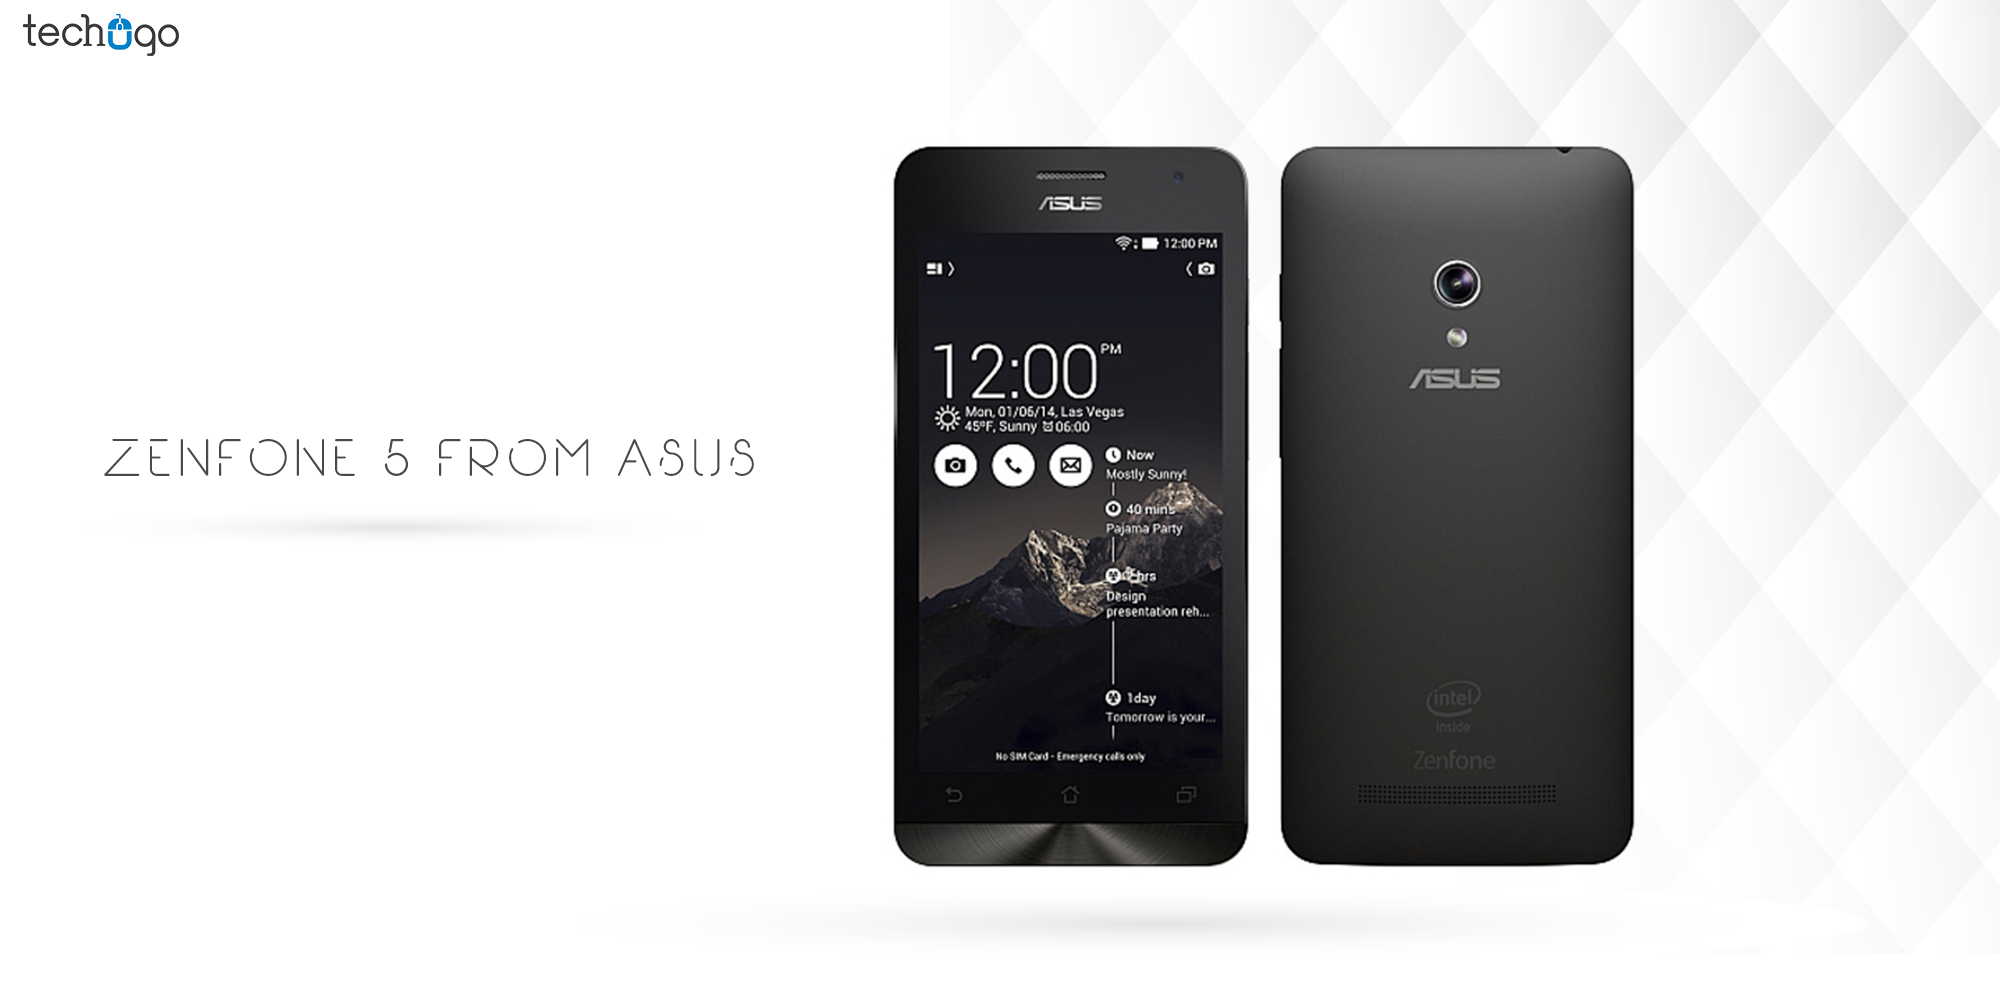 Zenfone 5 From Asus